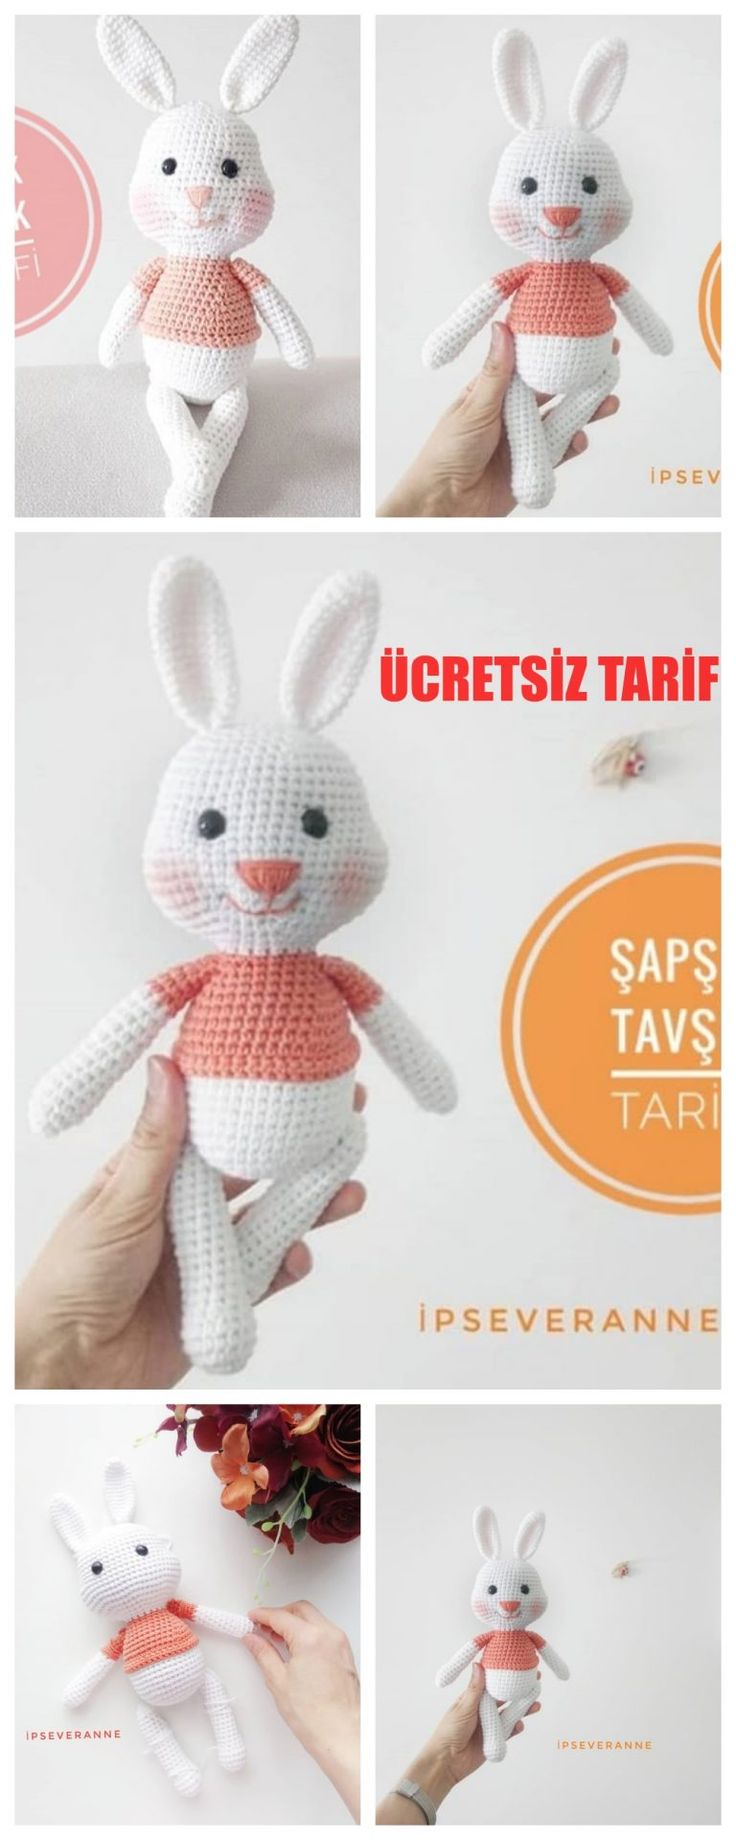 -amigurumi-oyuncak-ucretsiz-desen-aciklama-17 Amigurumi Oyuncak Ücretsiz Desen Açıklama